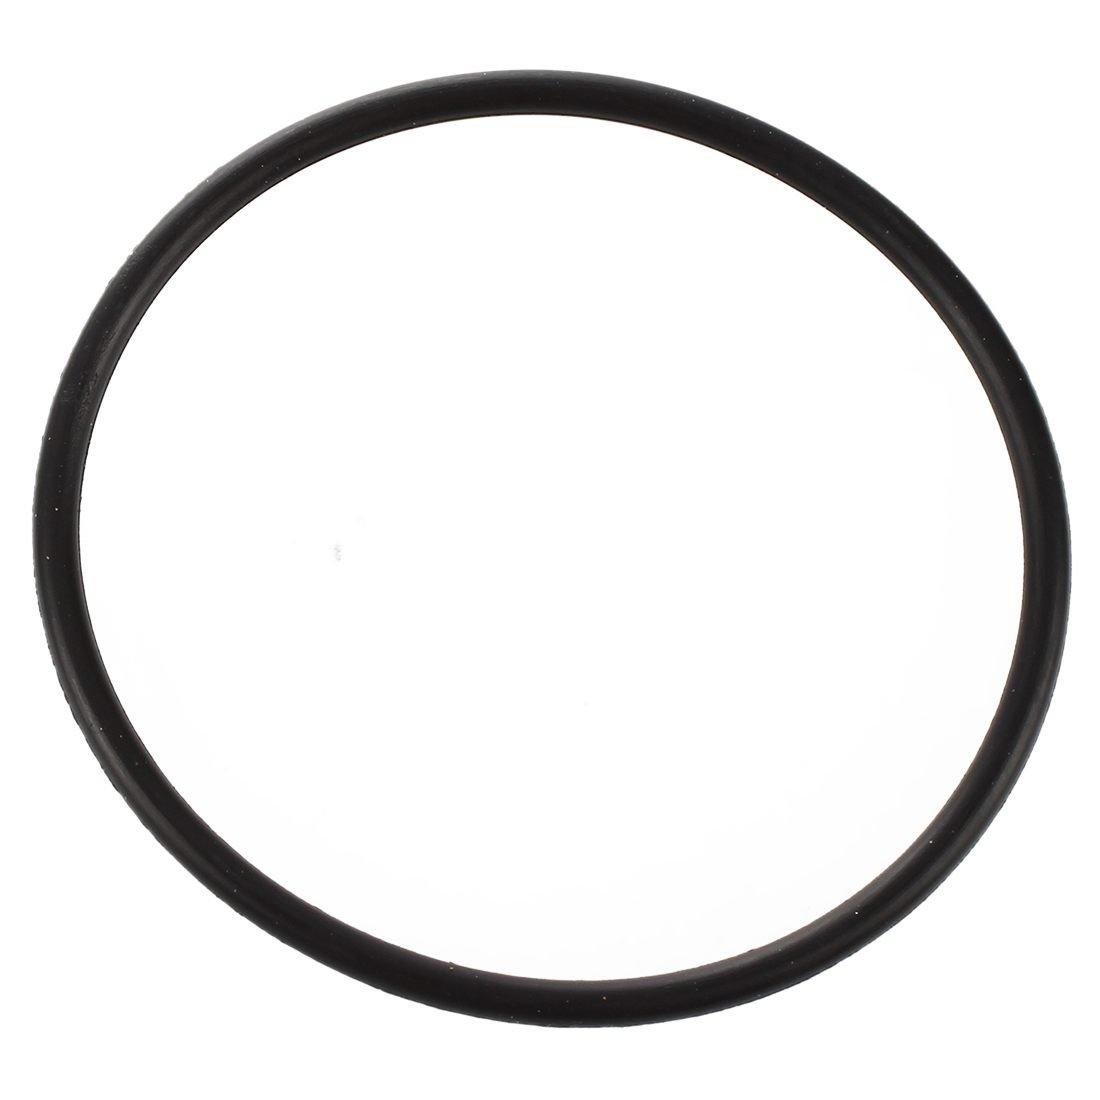 Semoic 10 x Junta torica de goma de Nitrilo Negro para sello de aceite 36mm x 40mm x 2mm